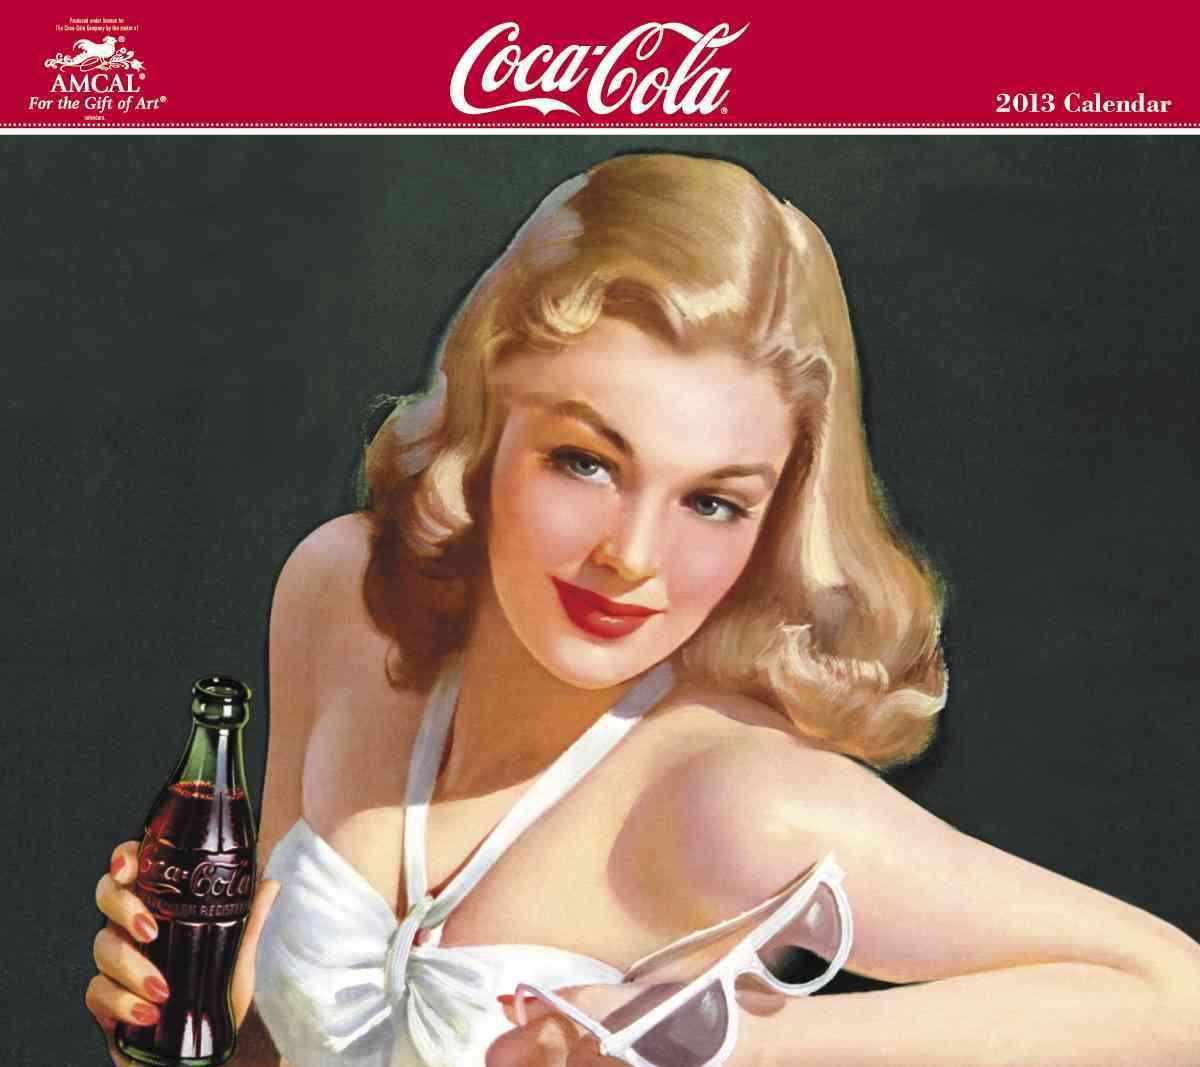 Coca-Cola 2013 Calendar